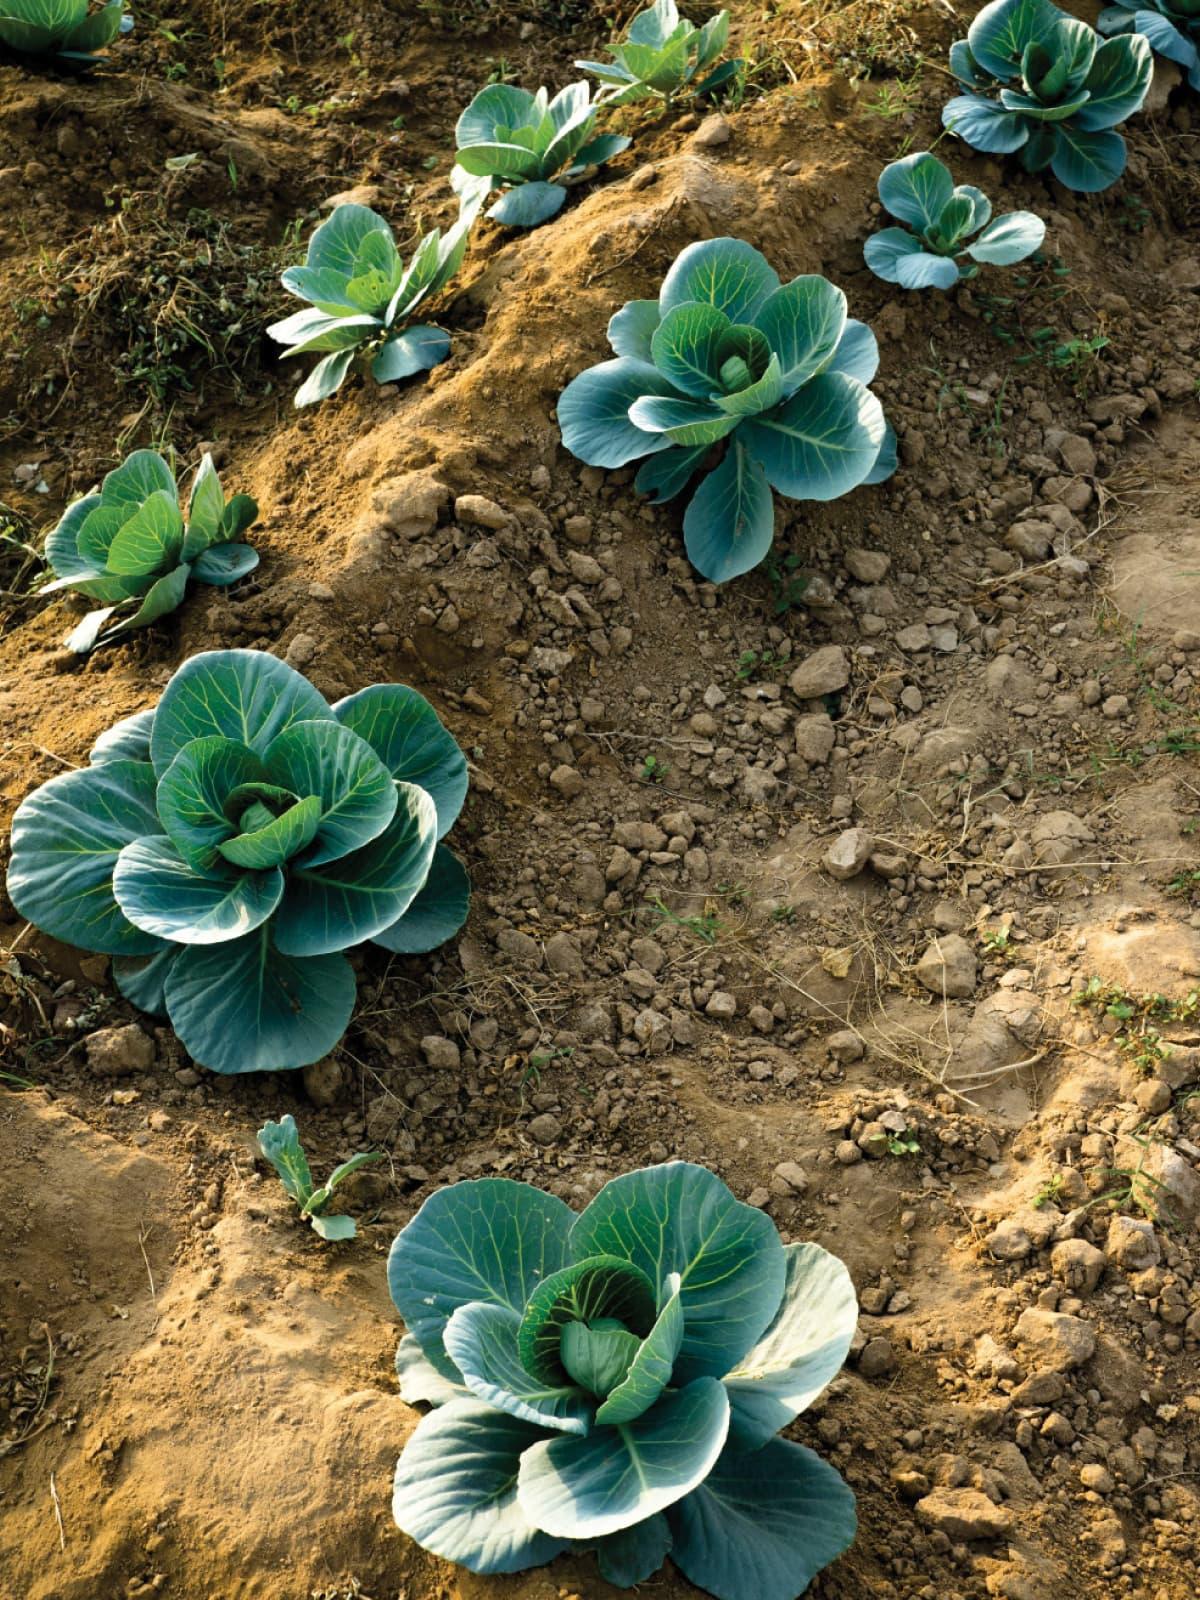 Cauliflower grown using fertilisers and pesticides at an inorganic farm